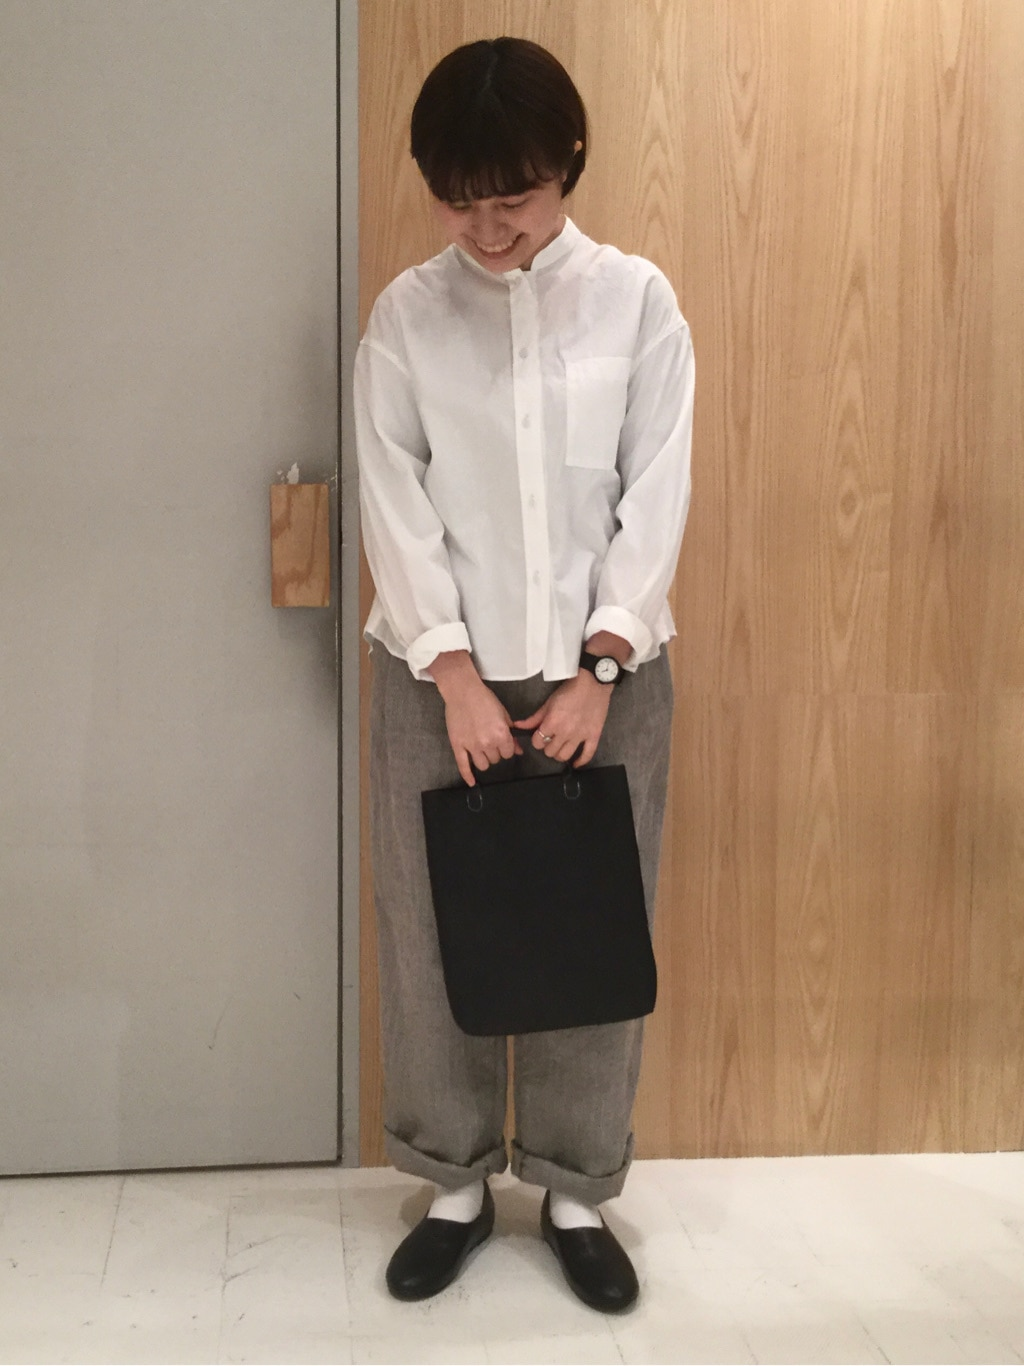 bulle de savon なんばシティ 身長:149cm 2020.03.15